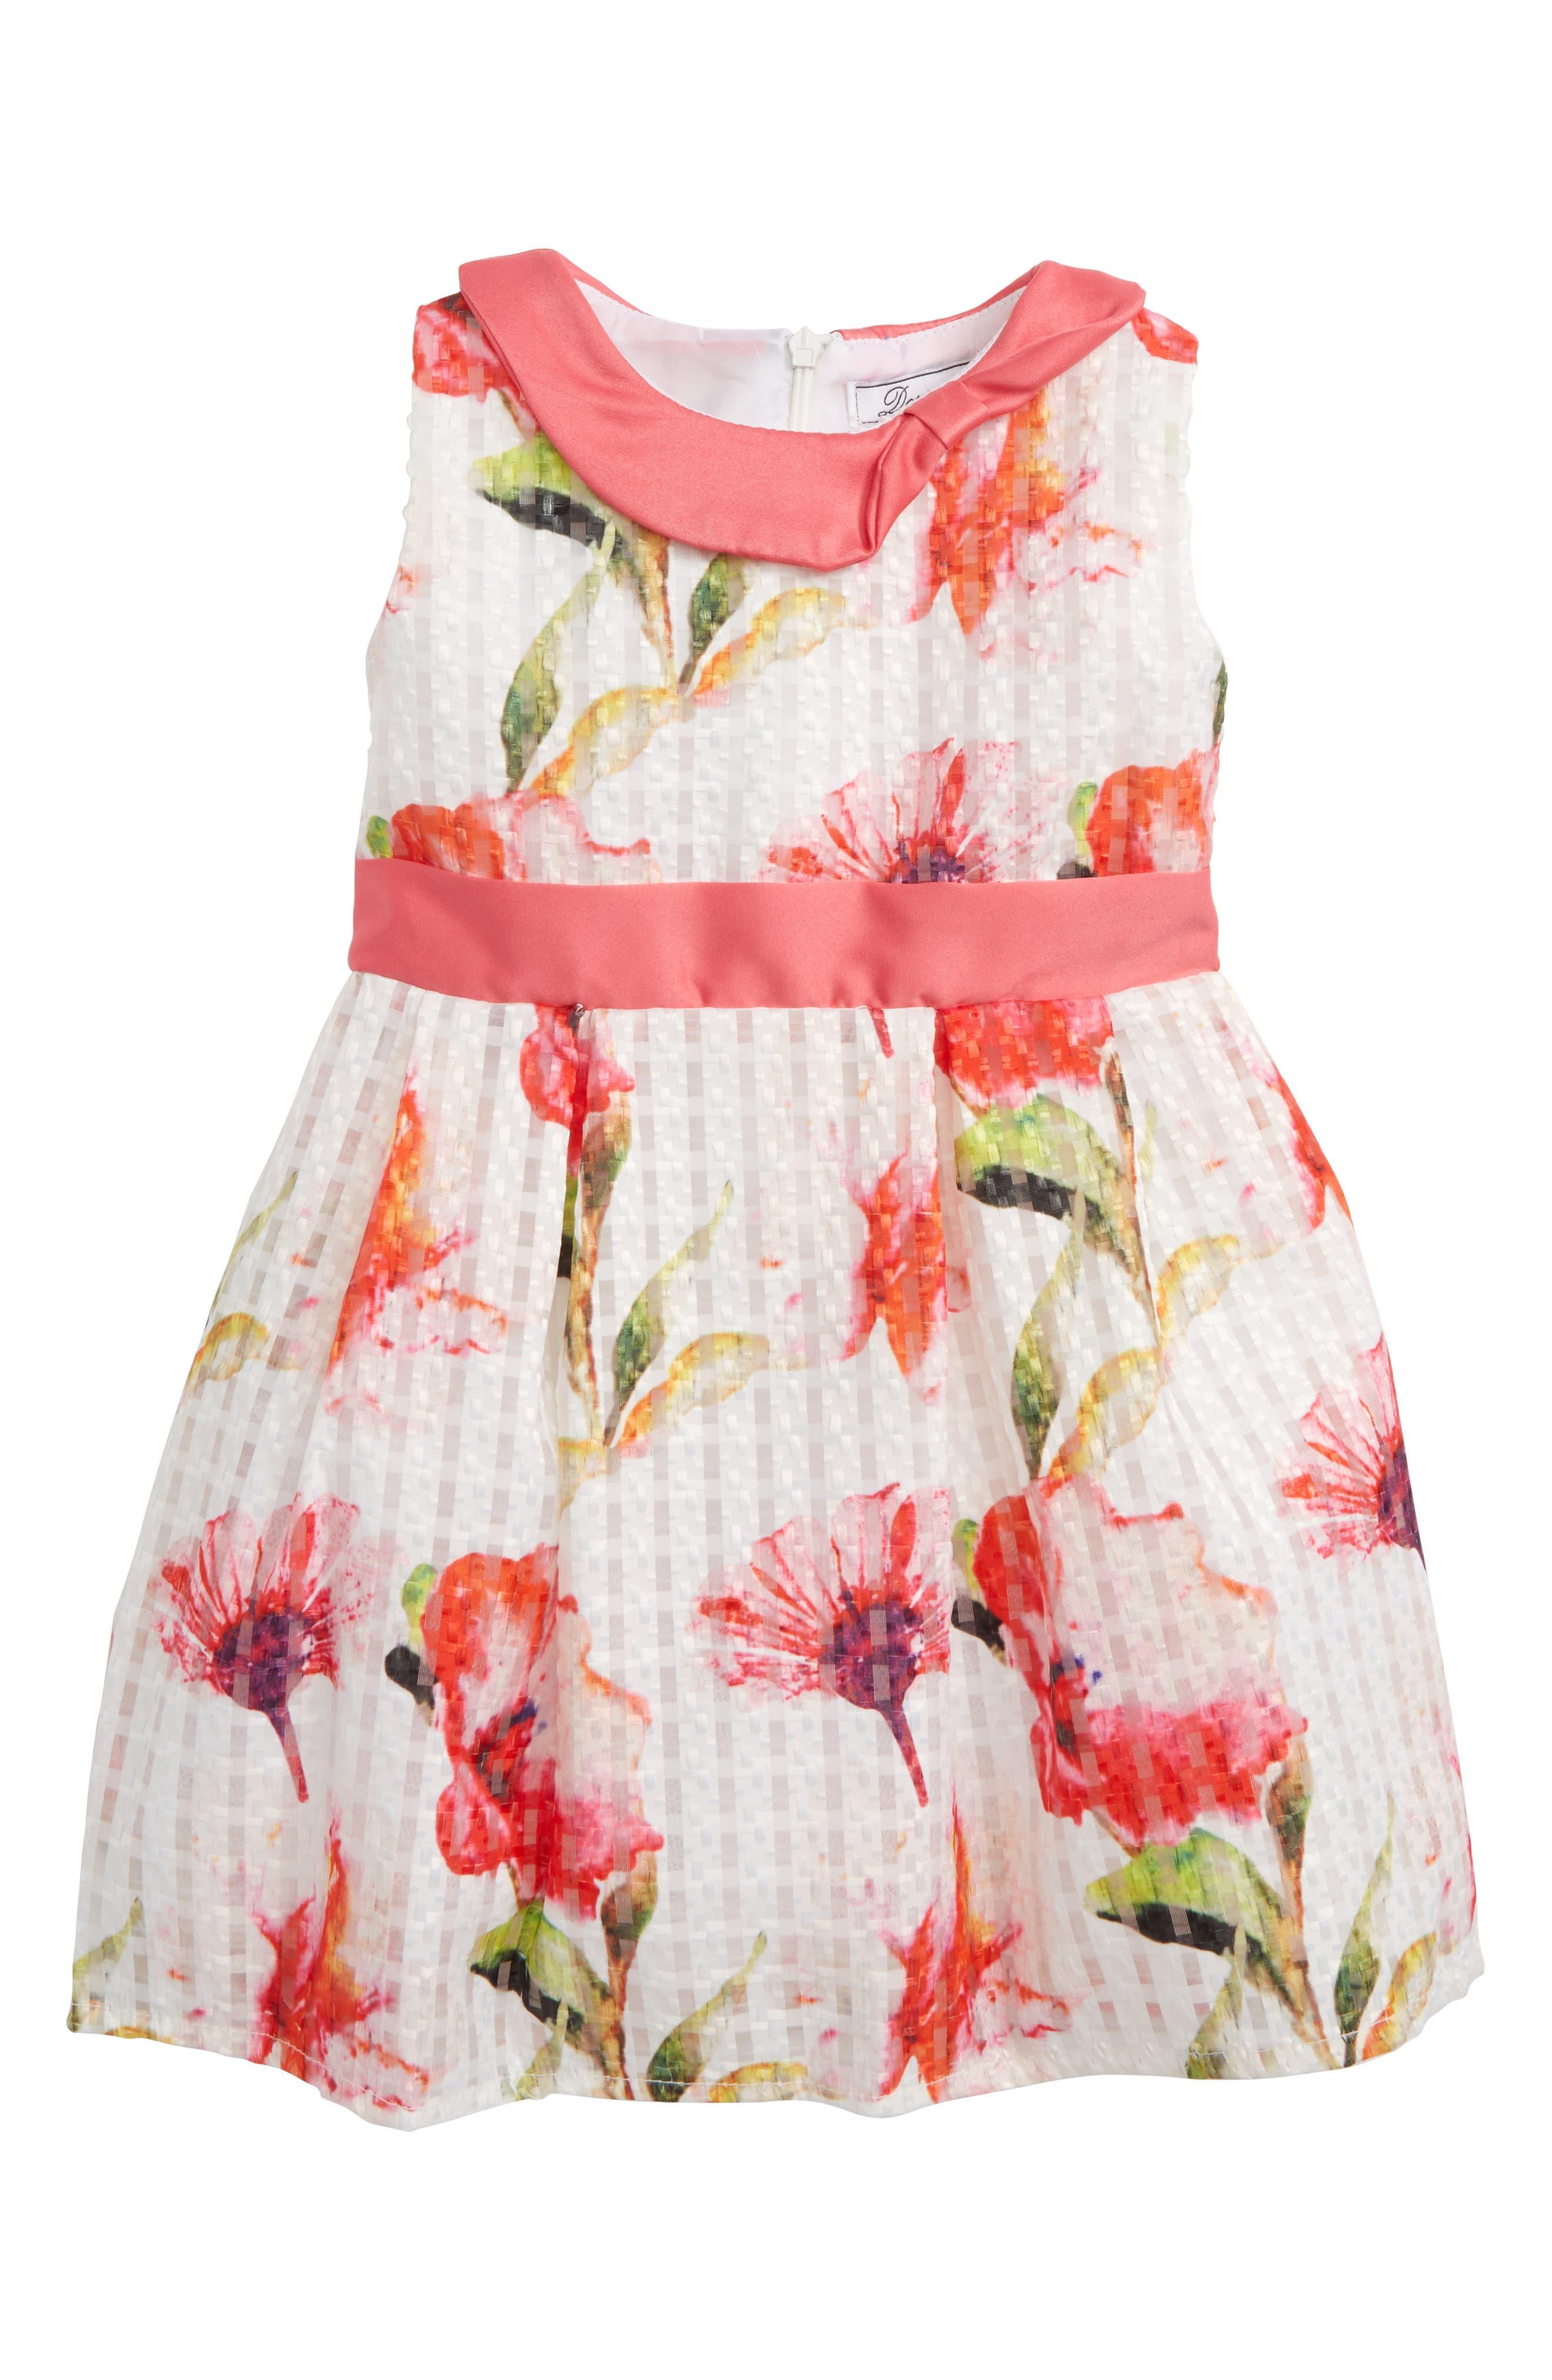 Veronica Flower Party Dress,                         Main,                         color, Multi Print